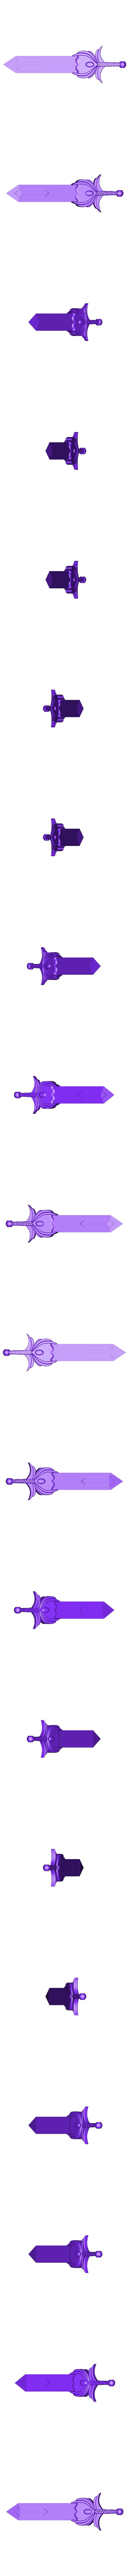 SHERA SWORD v7.stl Download free STL file Shera sword • 3D print template, ana_paty_ss